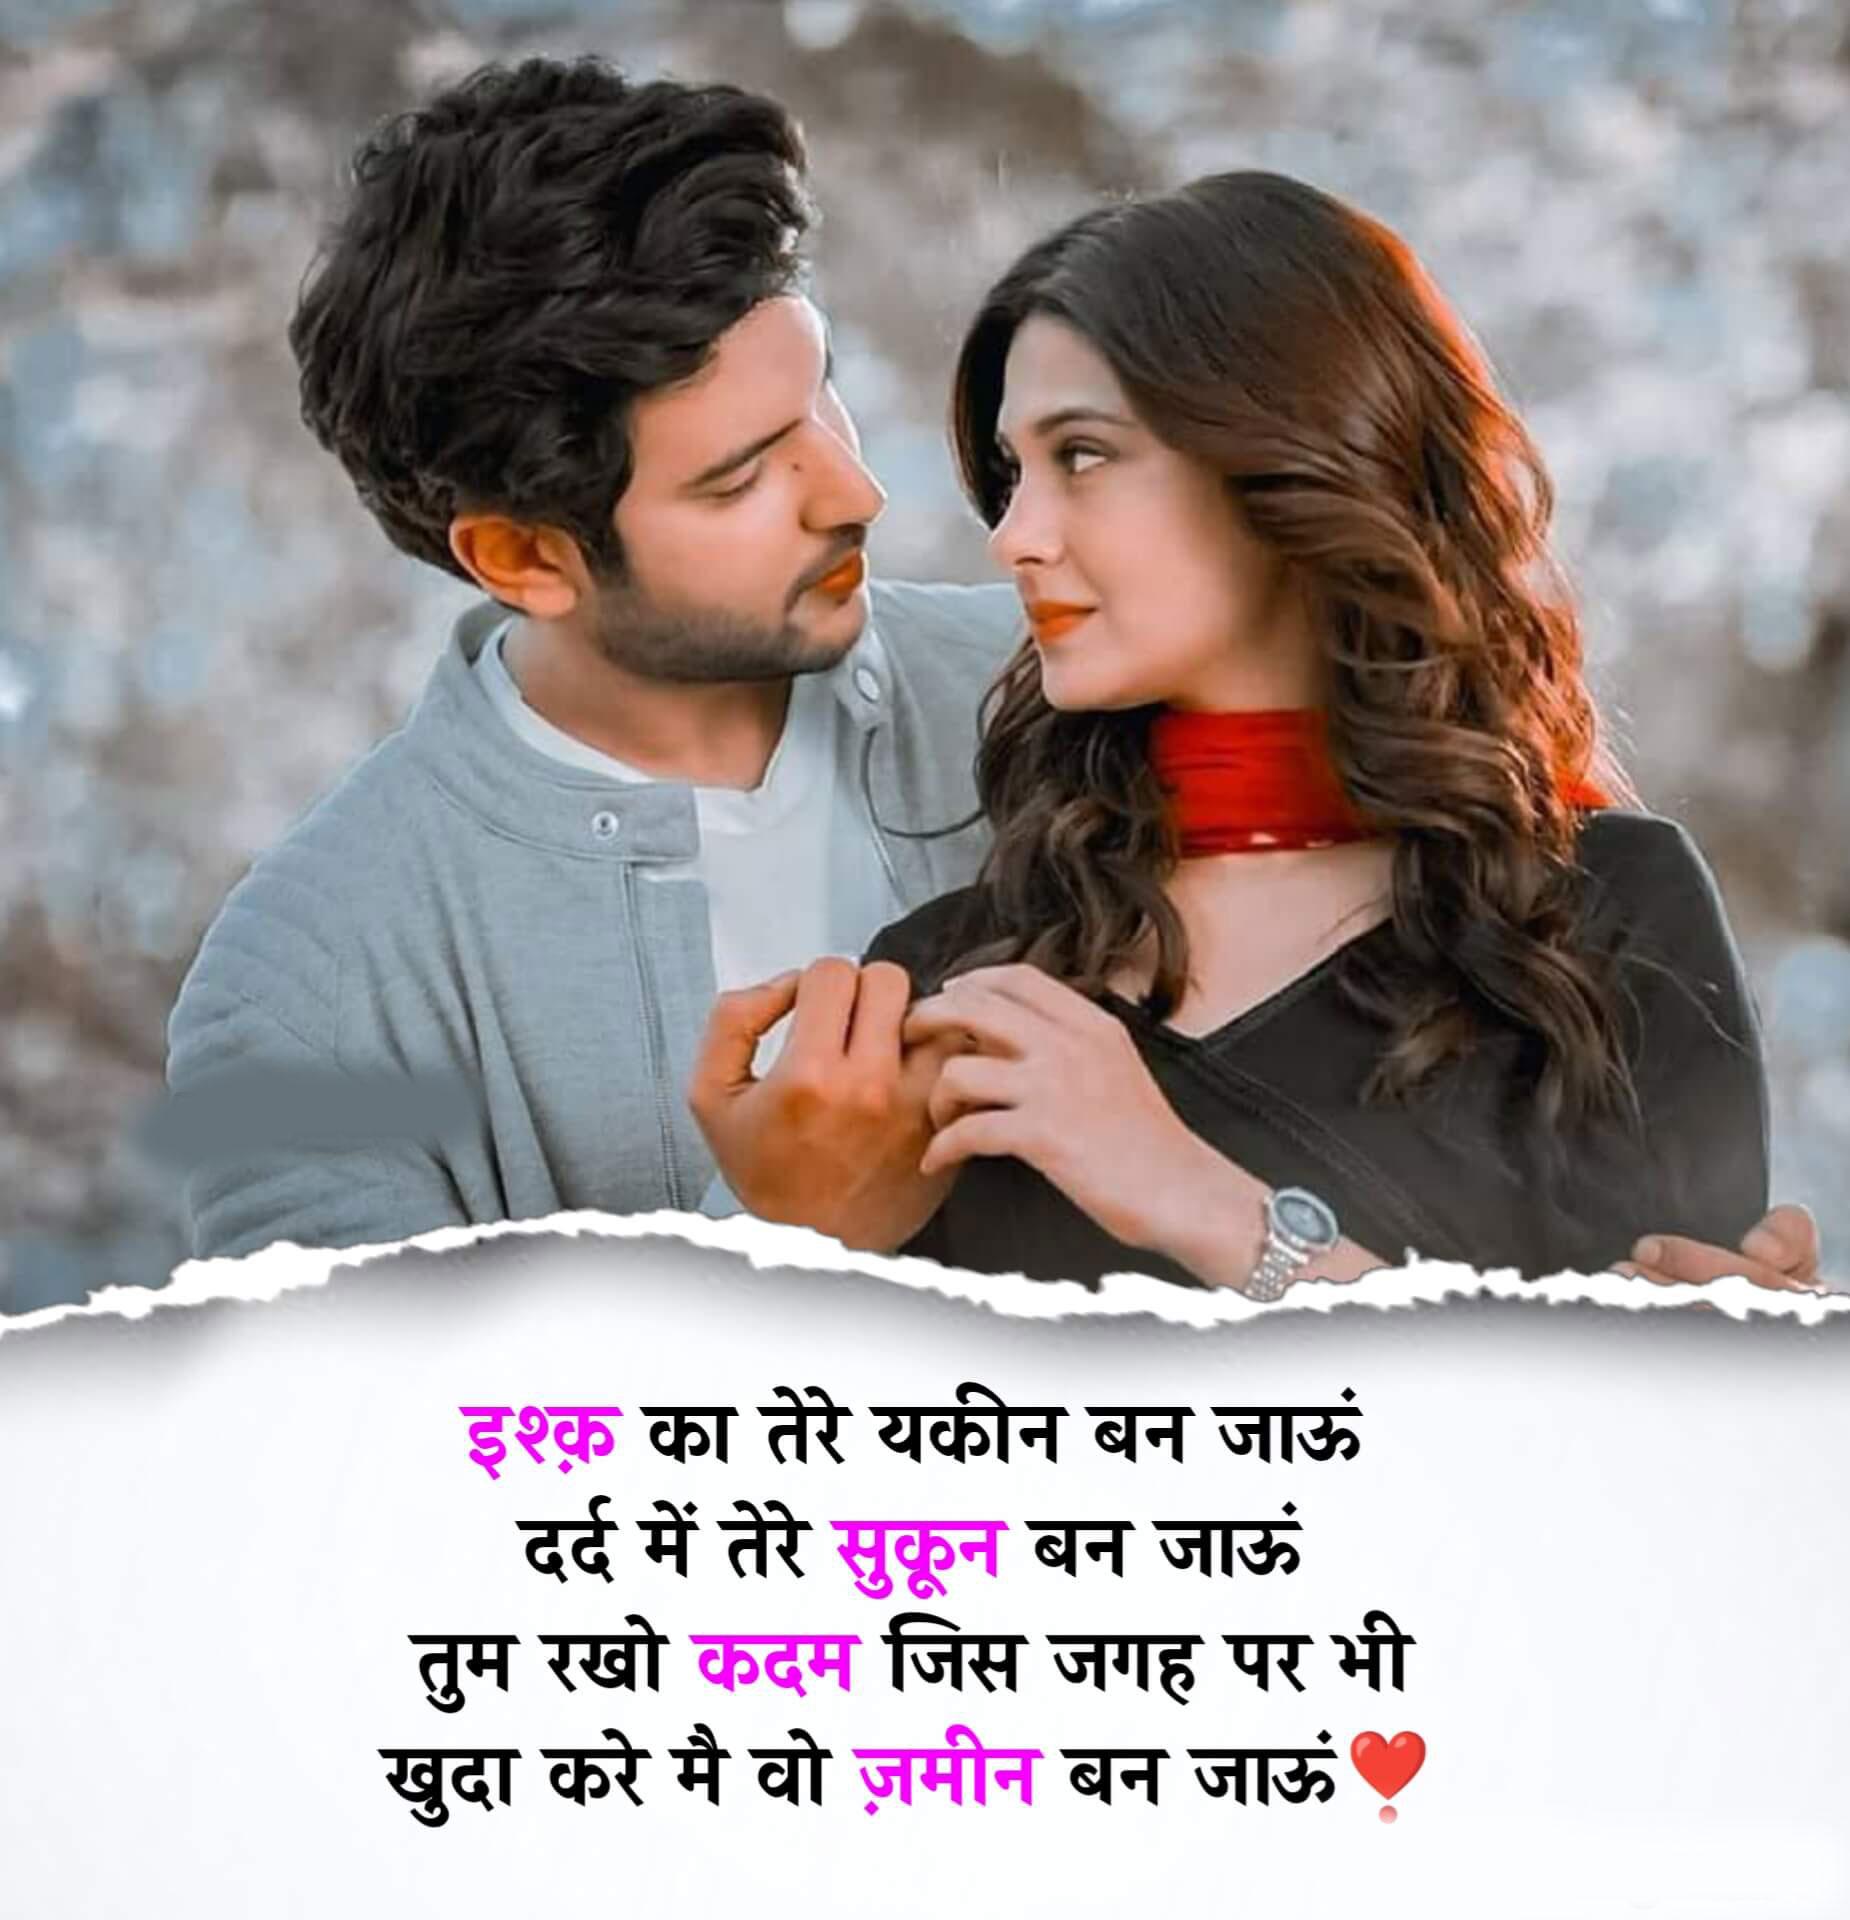 love shayari Latest Status Dp Images